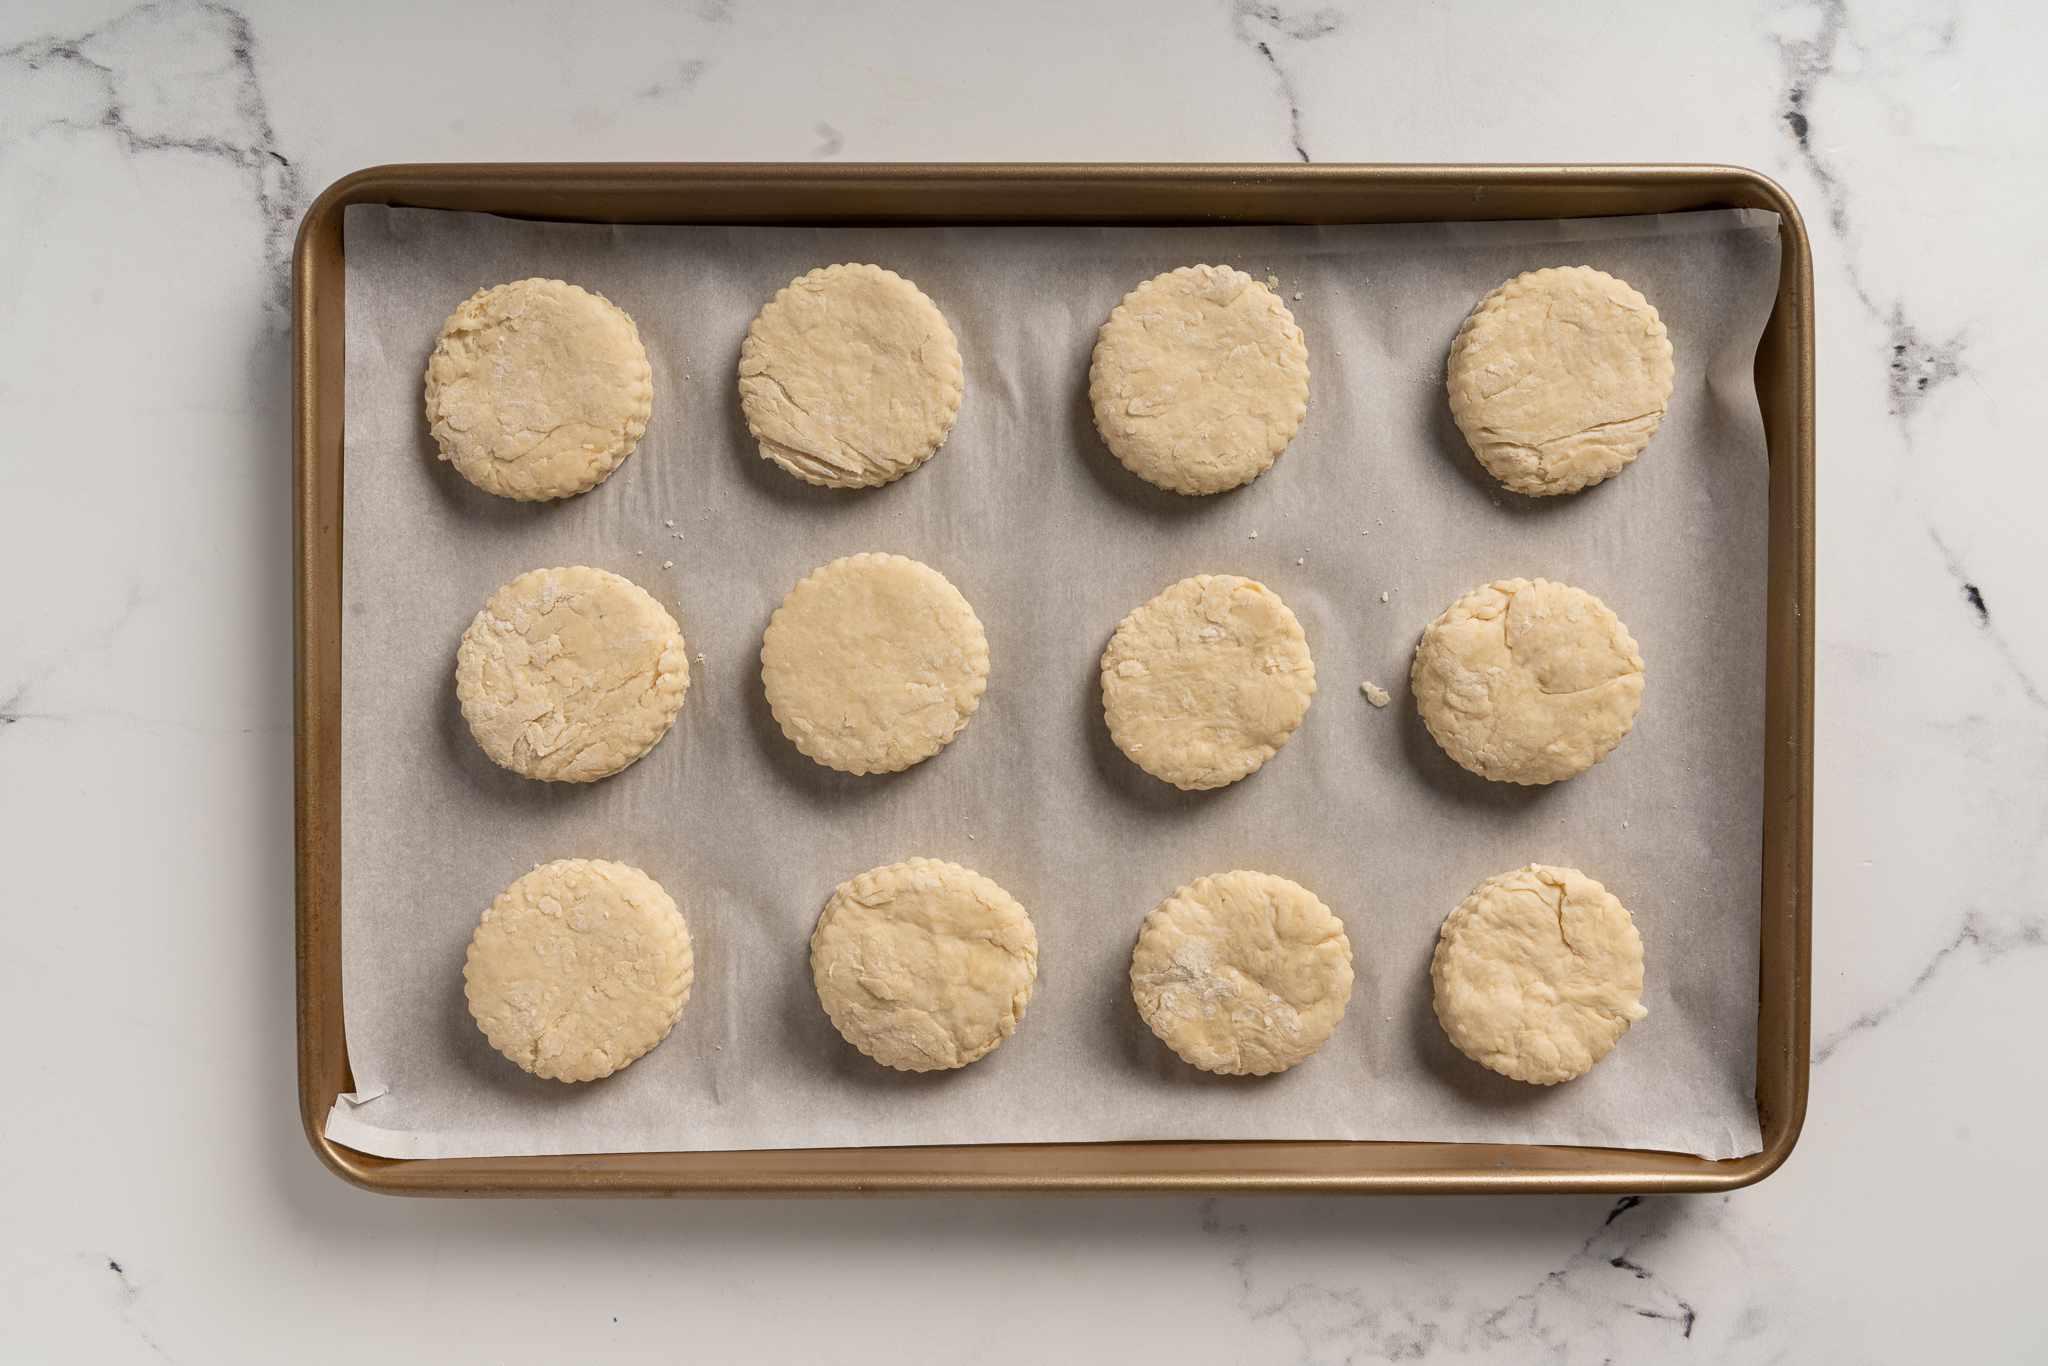 Pennsylvania Dutch Lard Biscuits on a baking sheet